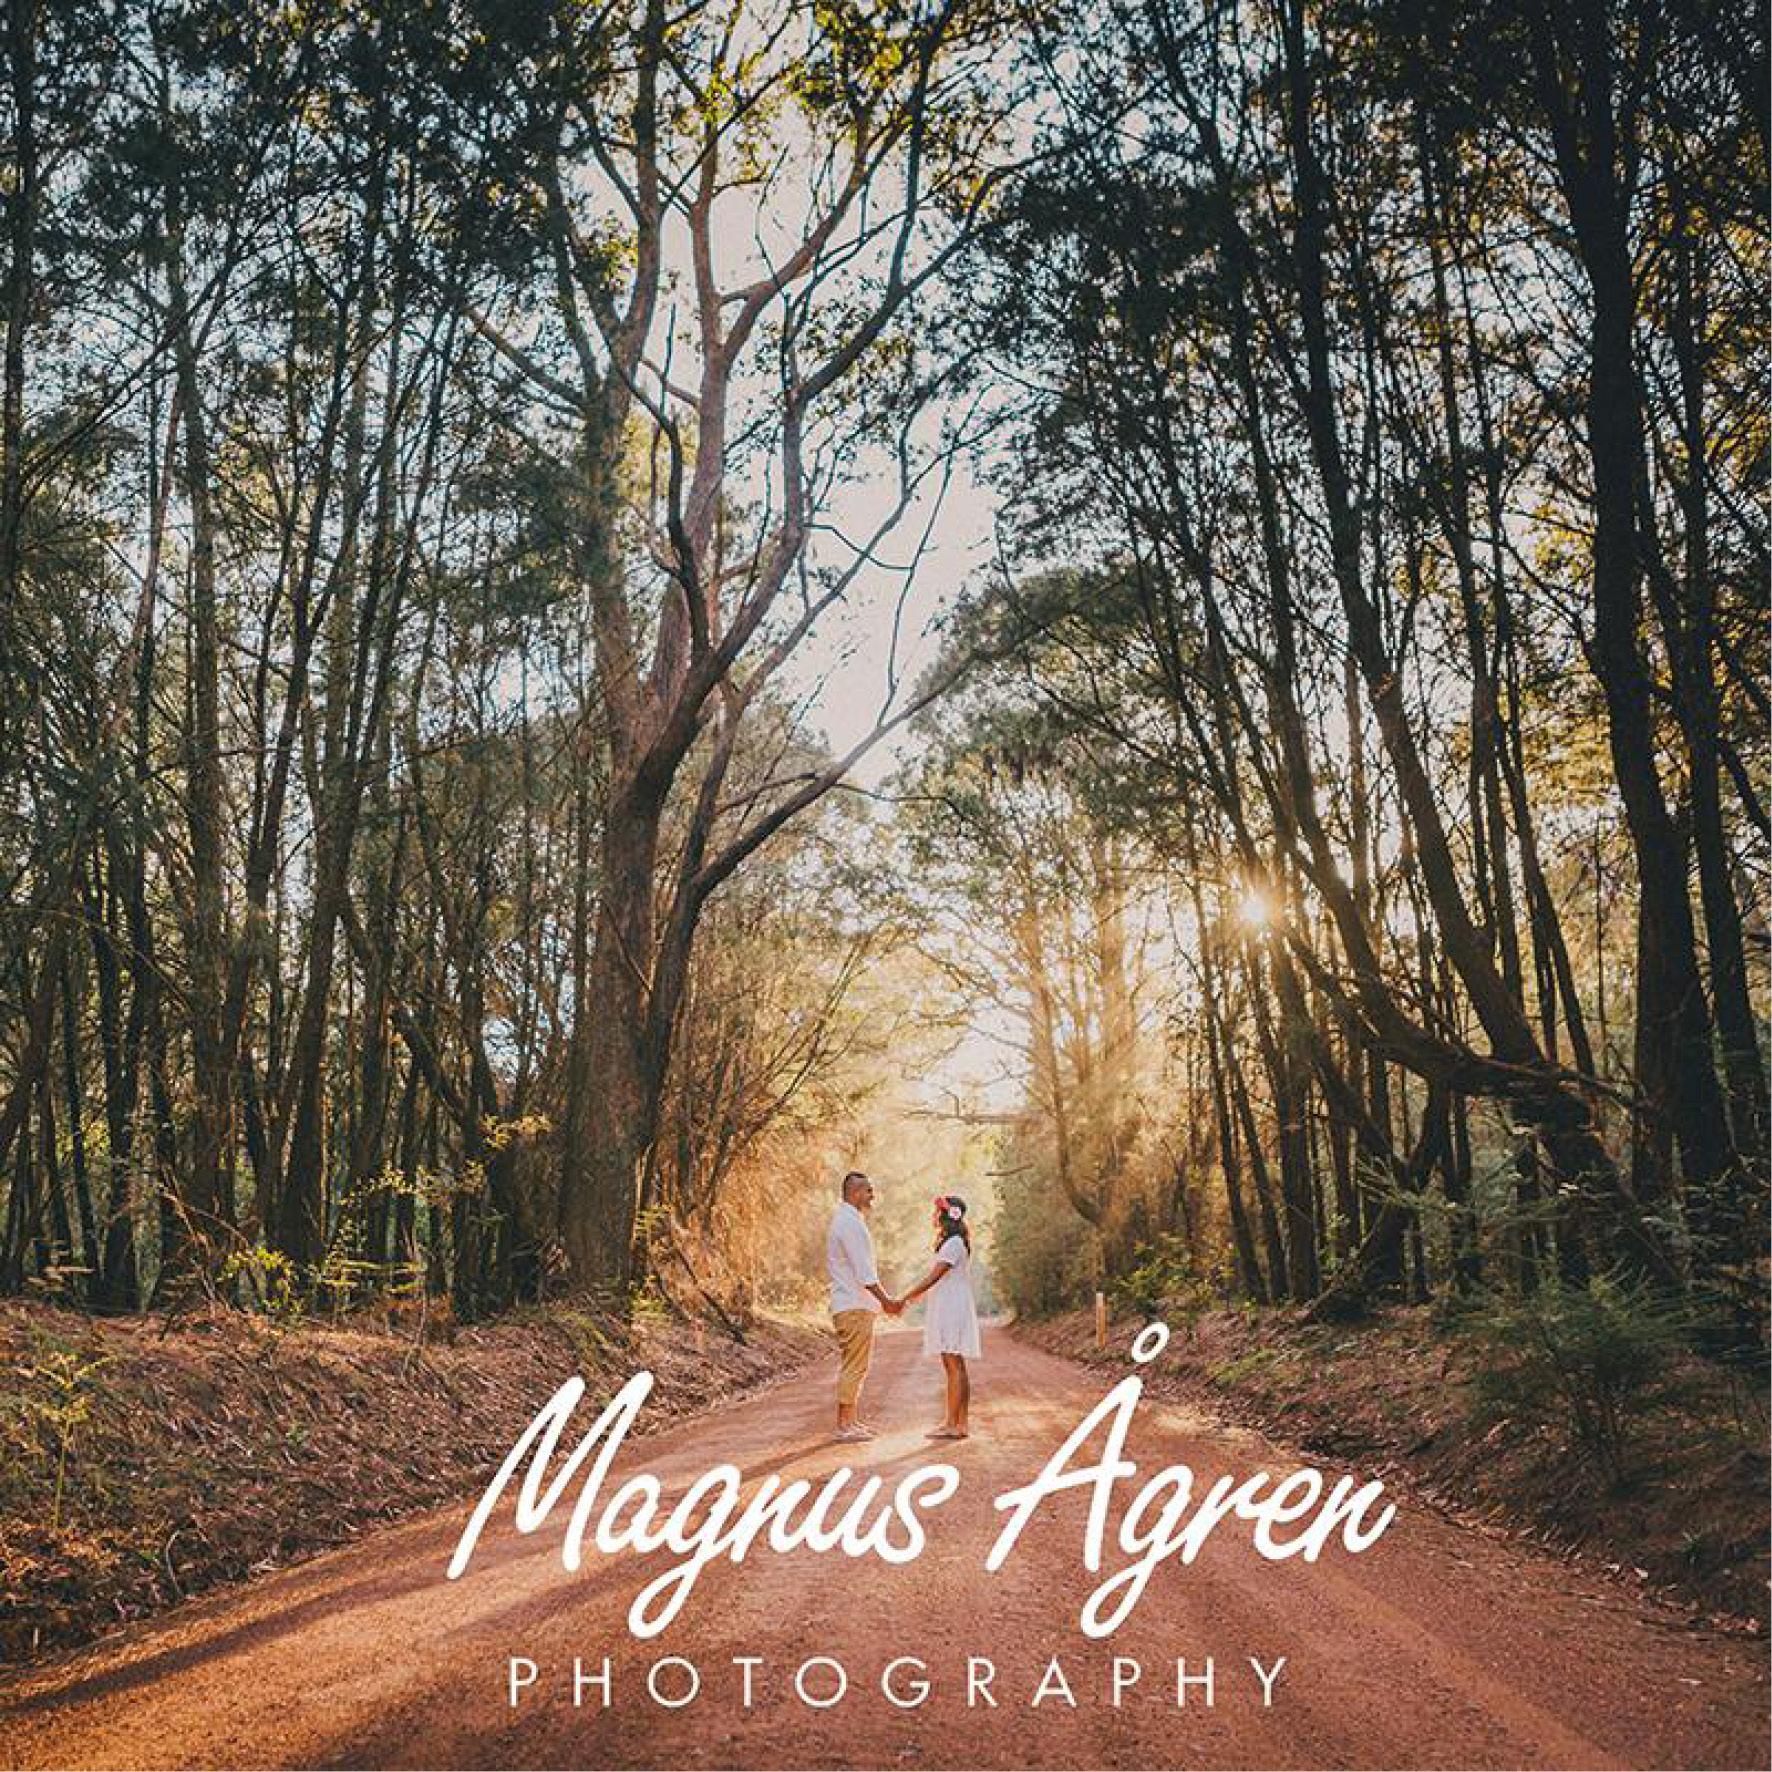 magnus_agren_photography